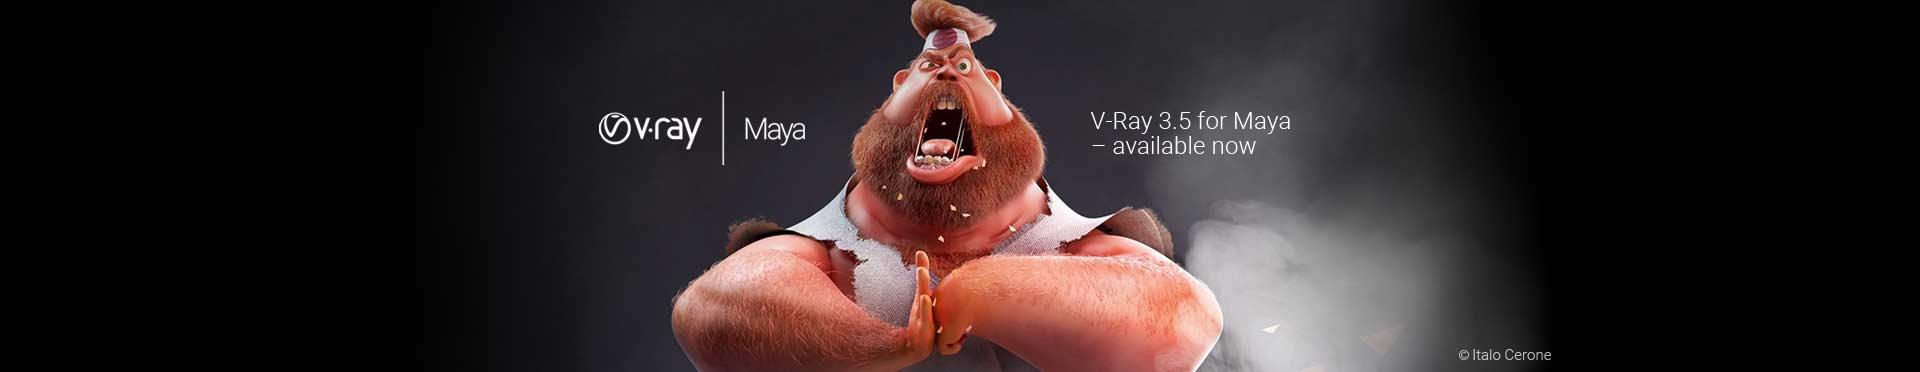 V-Ray 3.5 for Maya